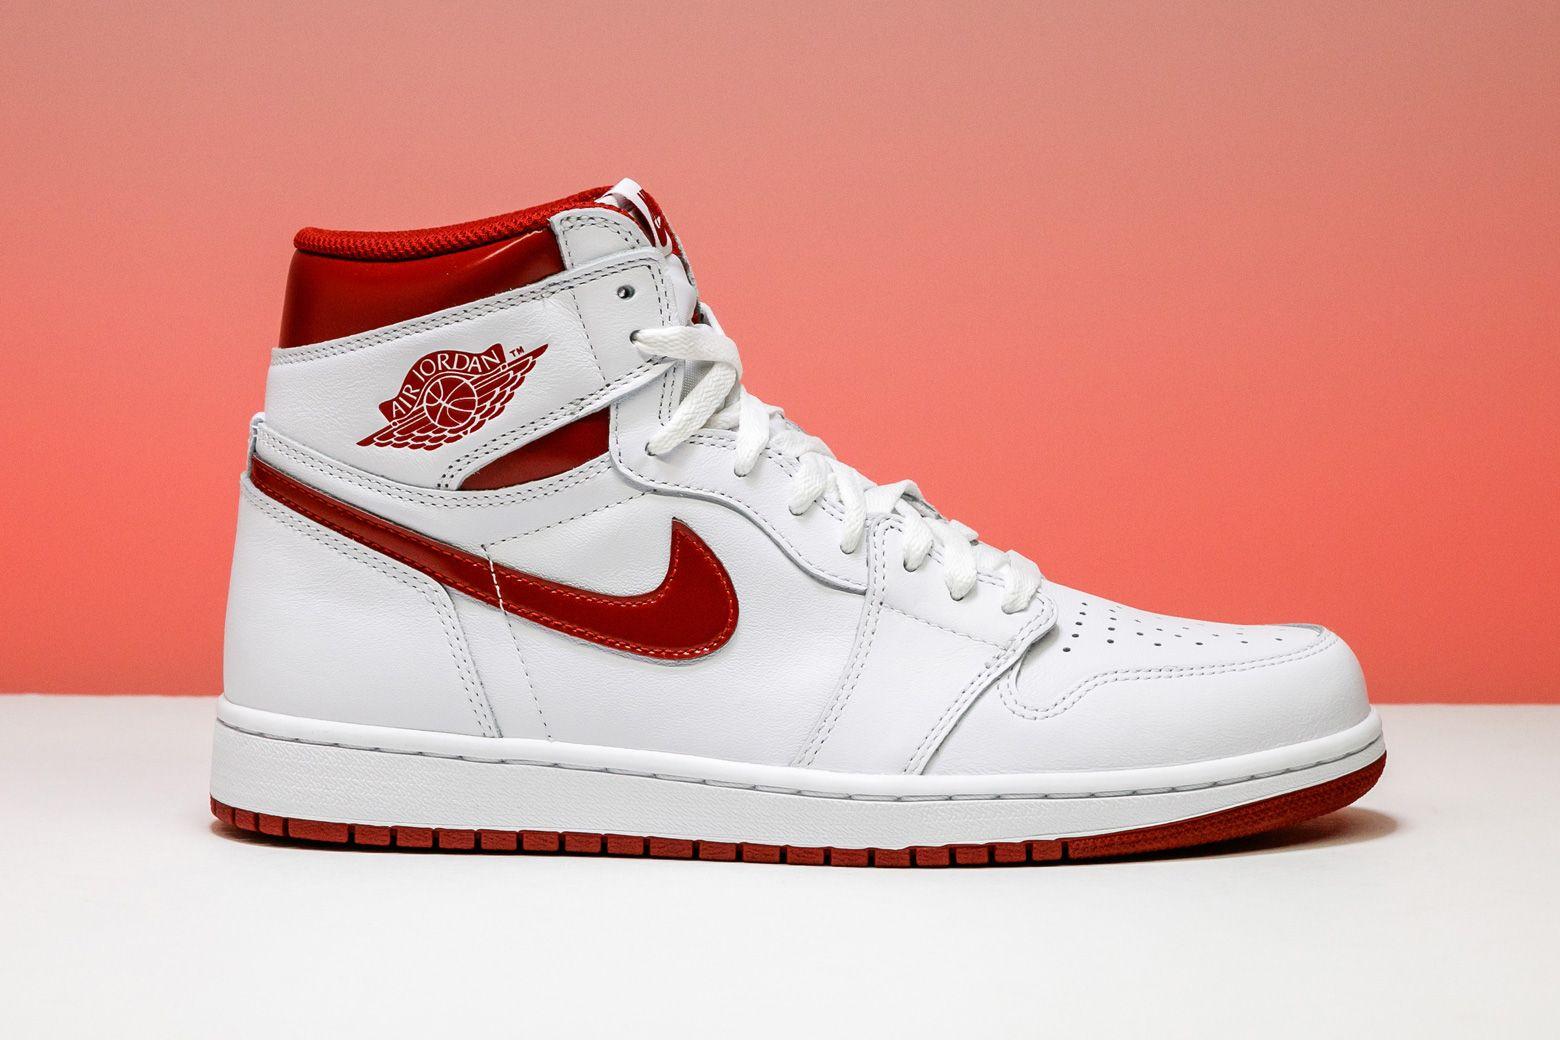 Air Jordan 1 Retro High Og Metallic Red 555088 103 With